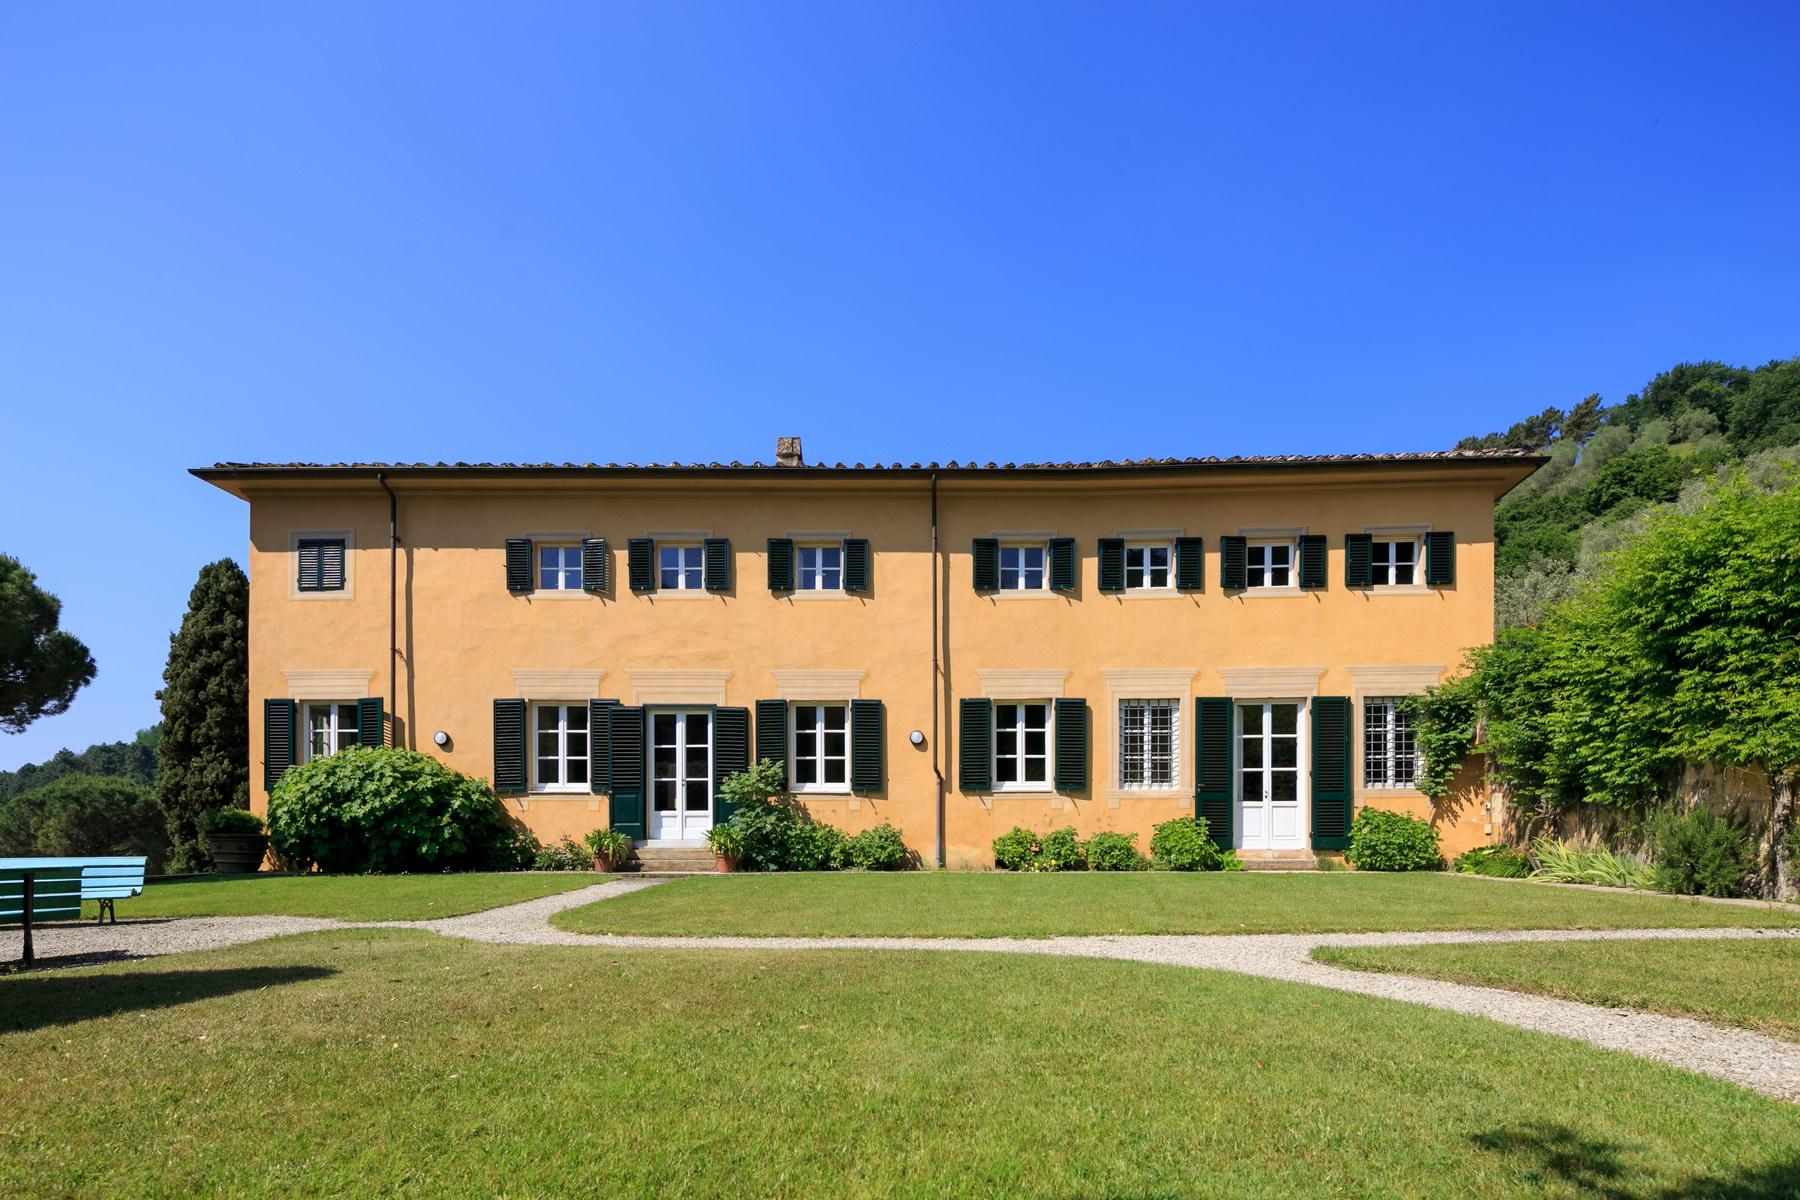 Villa in Vendita a Lucca: 5 locali, 1500 mq - Foto 1